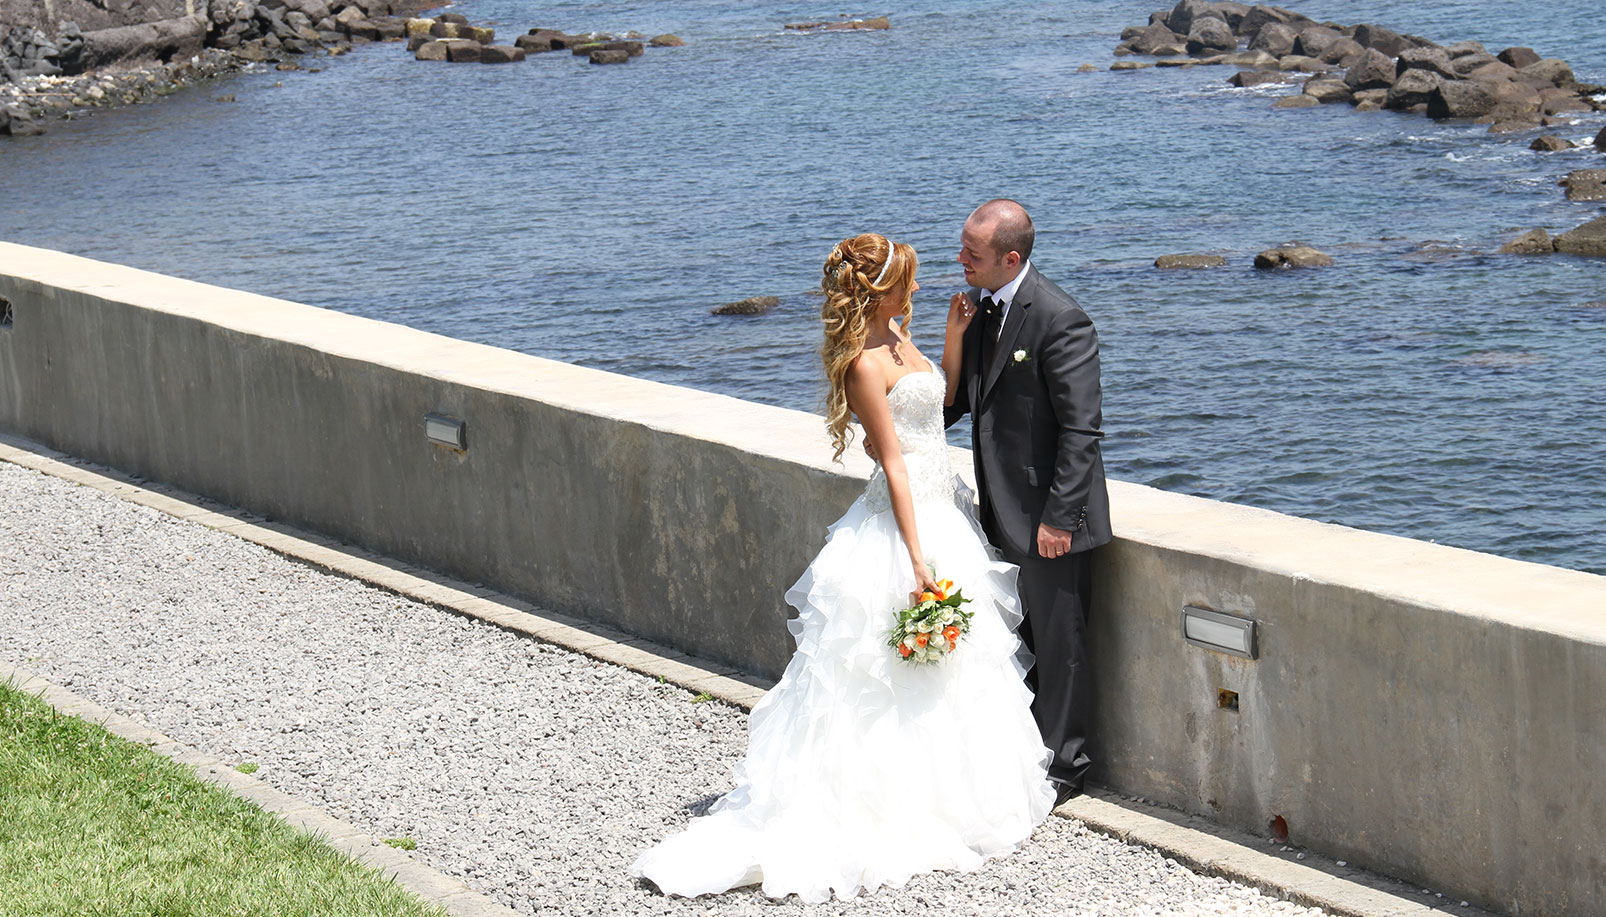 karotina, sara, blog, matrimonio, wedding, okspecialday, specialday